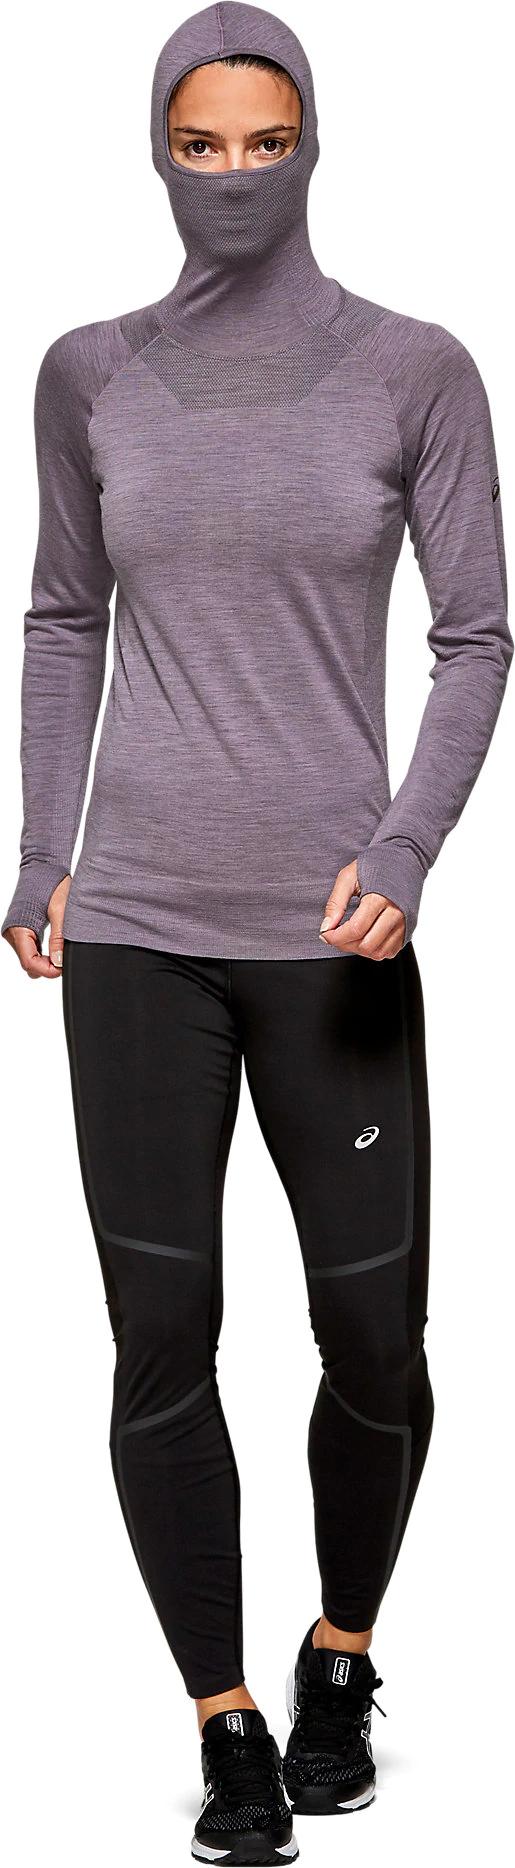 Women's Metarun Long Sleeve | Lavender Grey | Long Sleeve Shirts ...